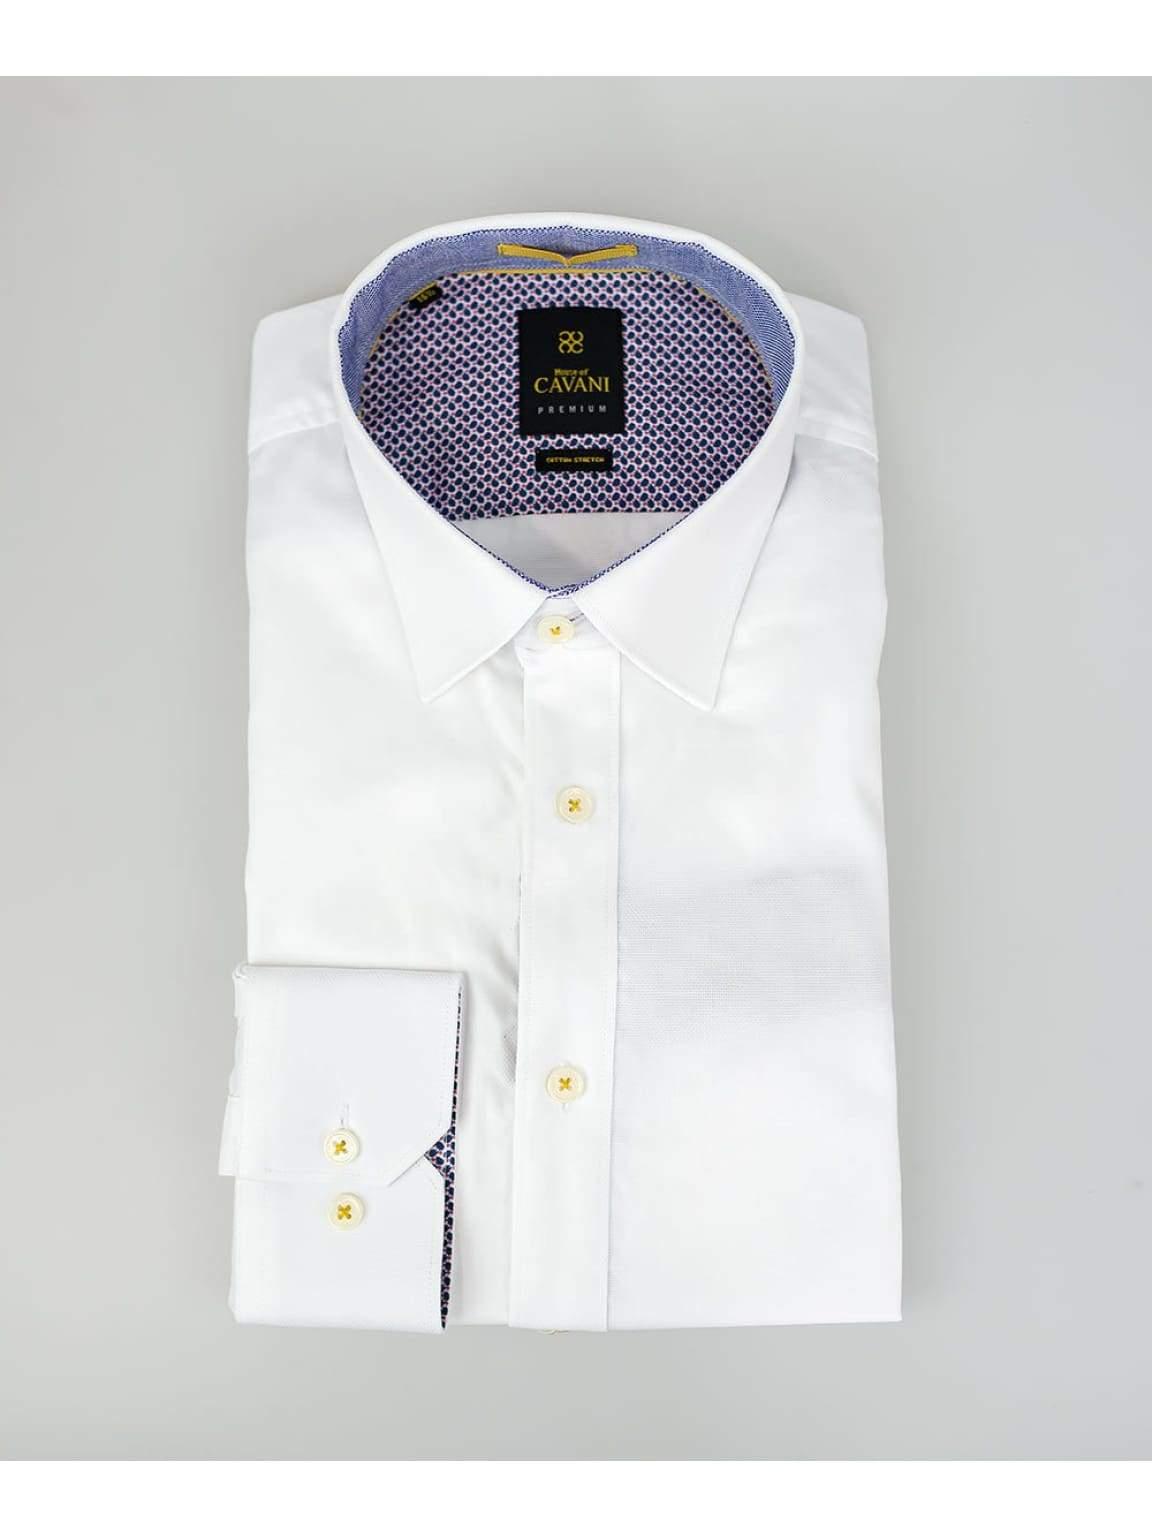 Mens White Oxford Stretch Shirt by Cavani - UK 14.5   EU 37 - Shirts